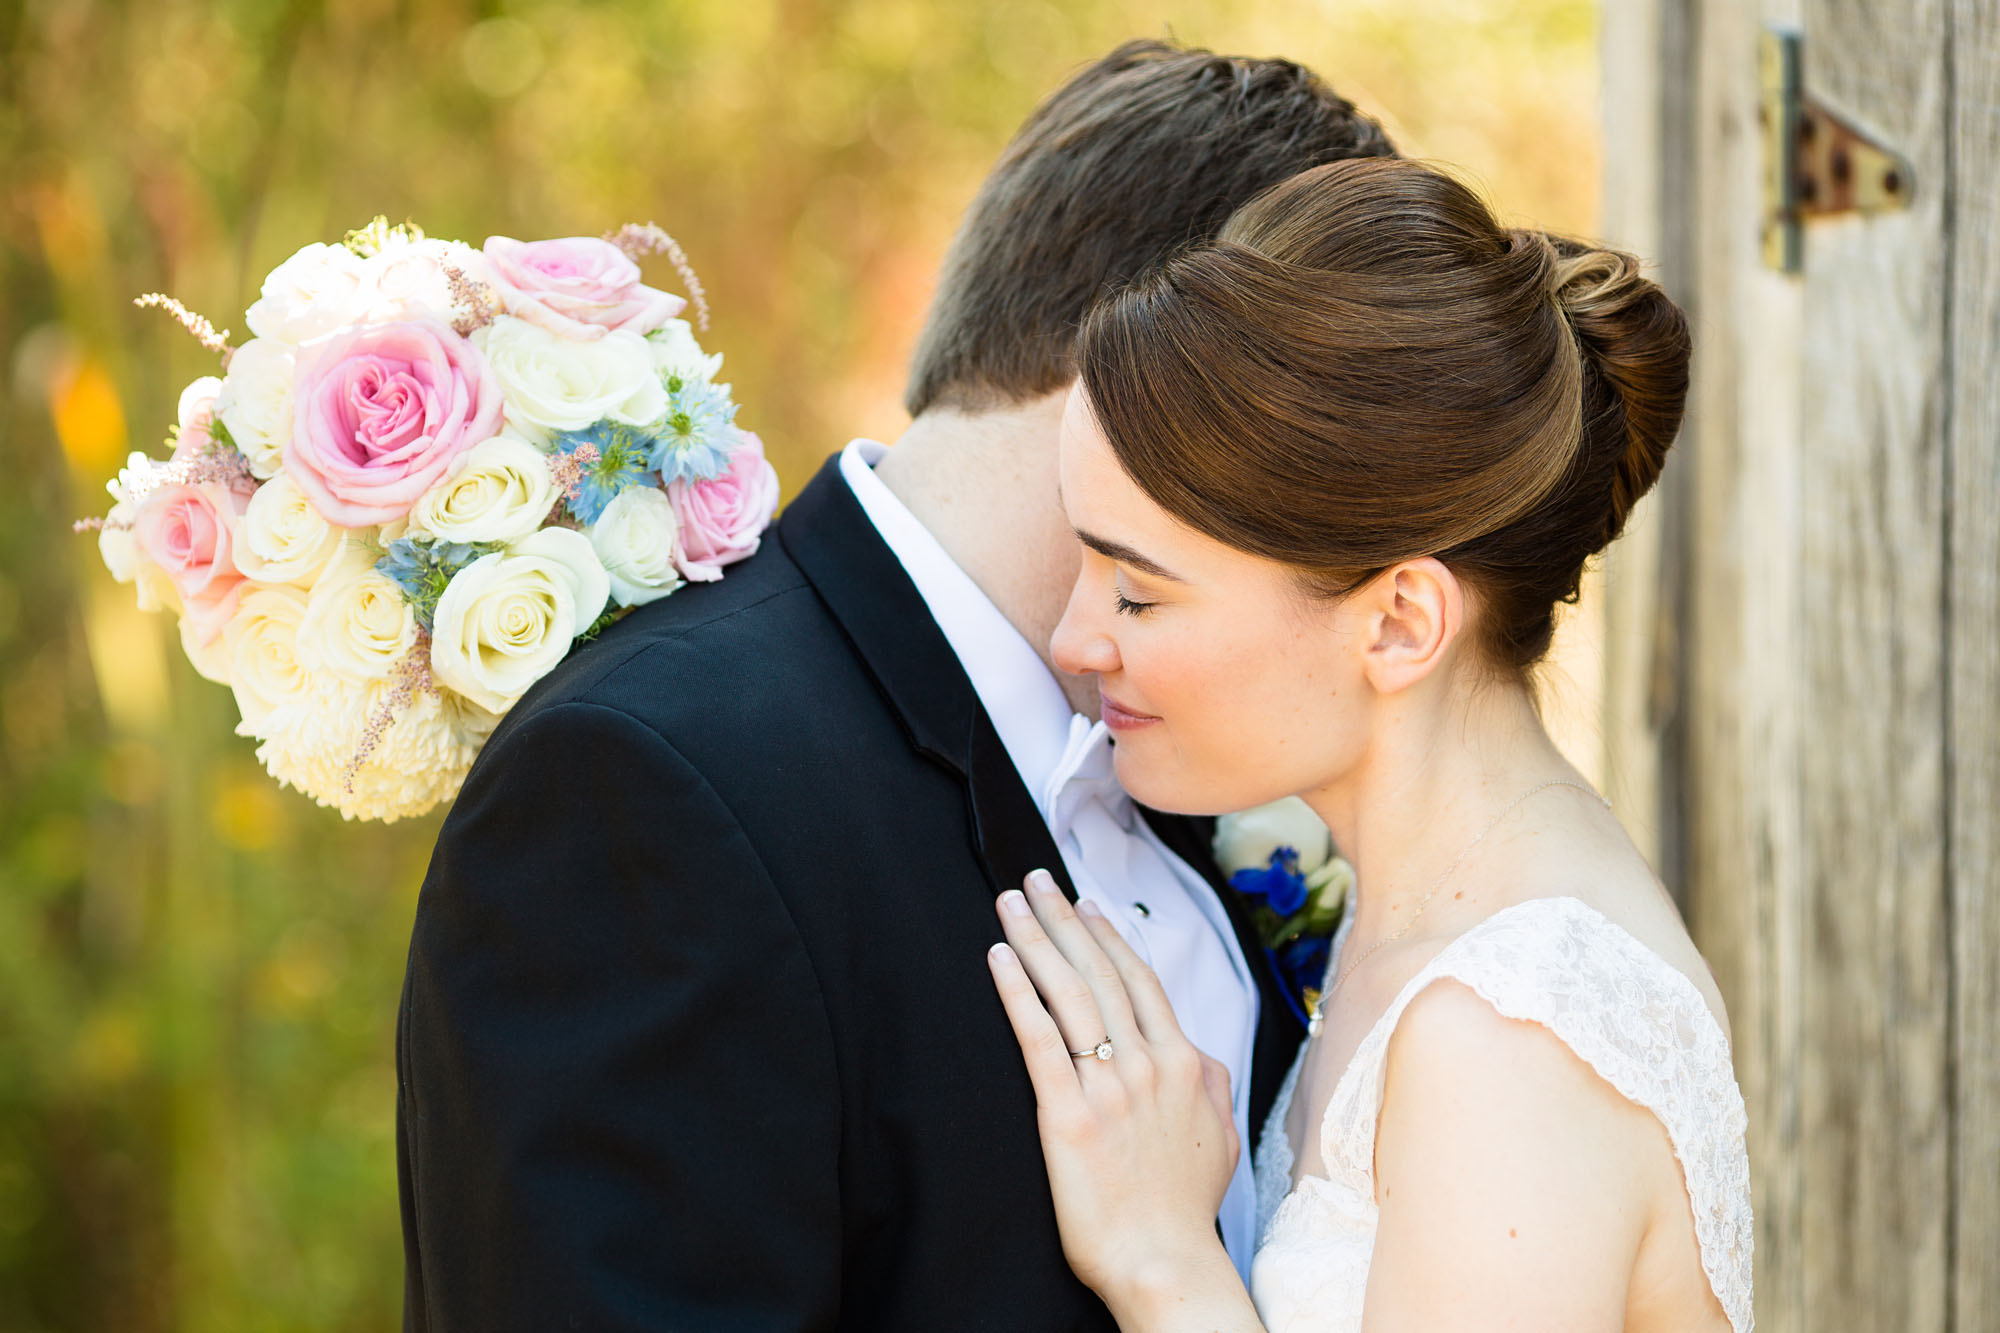 A photographer's dream wedding: Lara and Matt's Wedding at the Barker Tavern